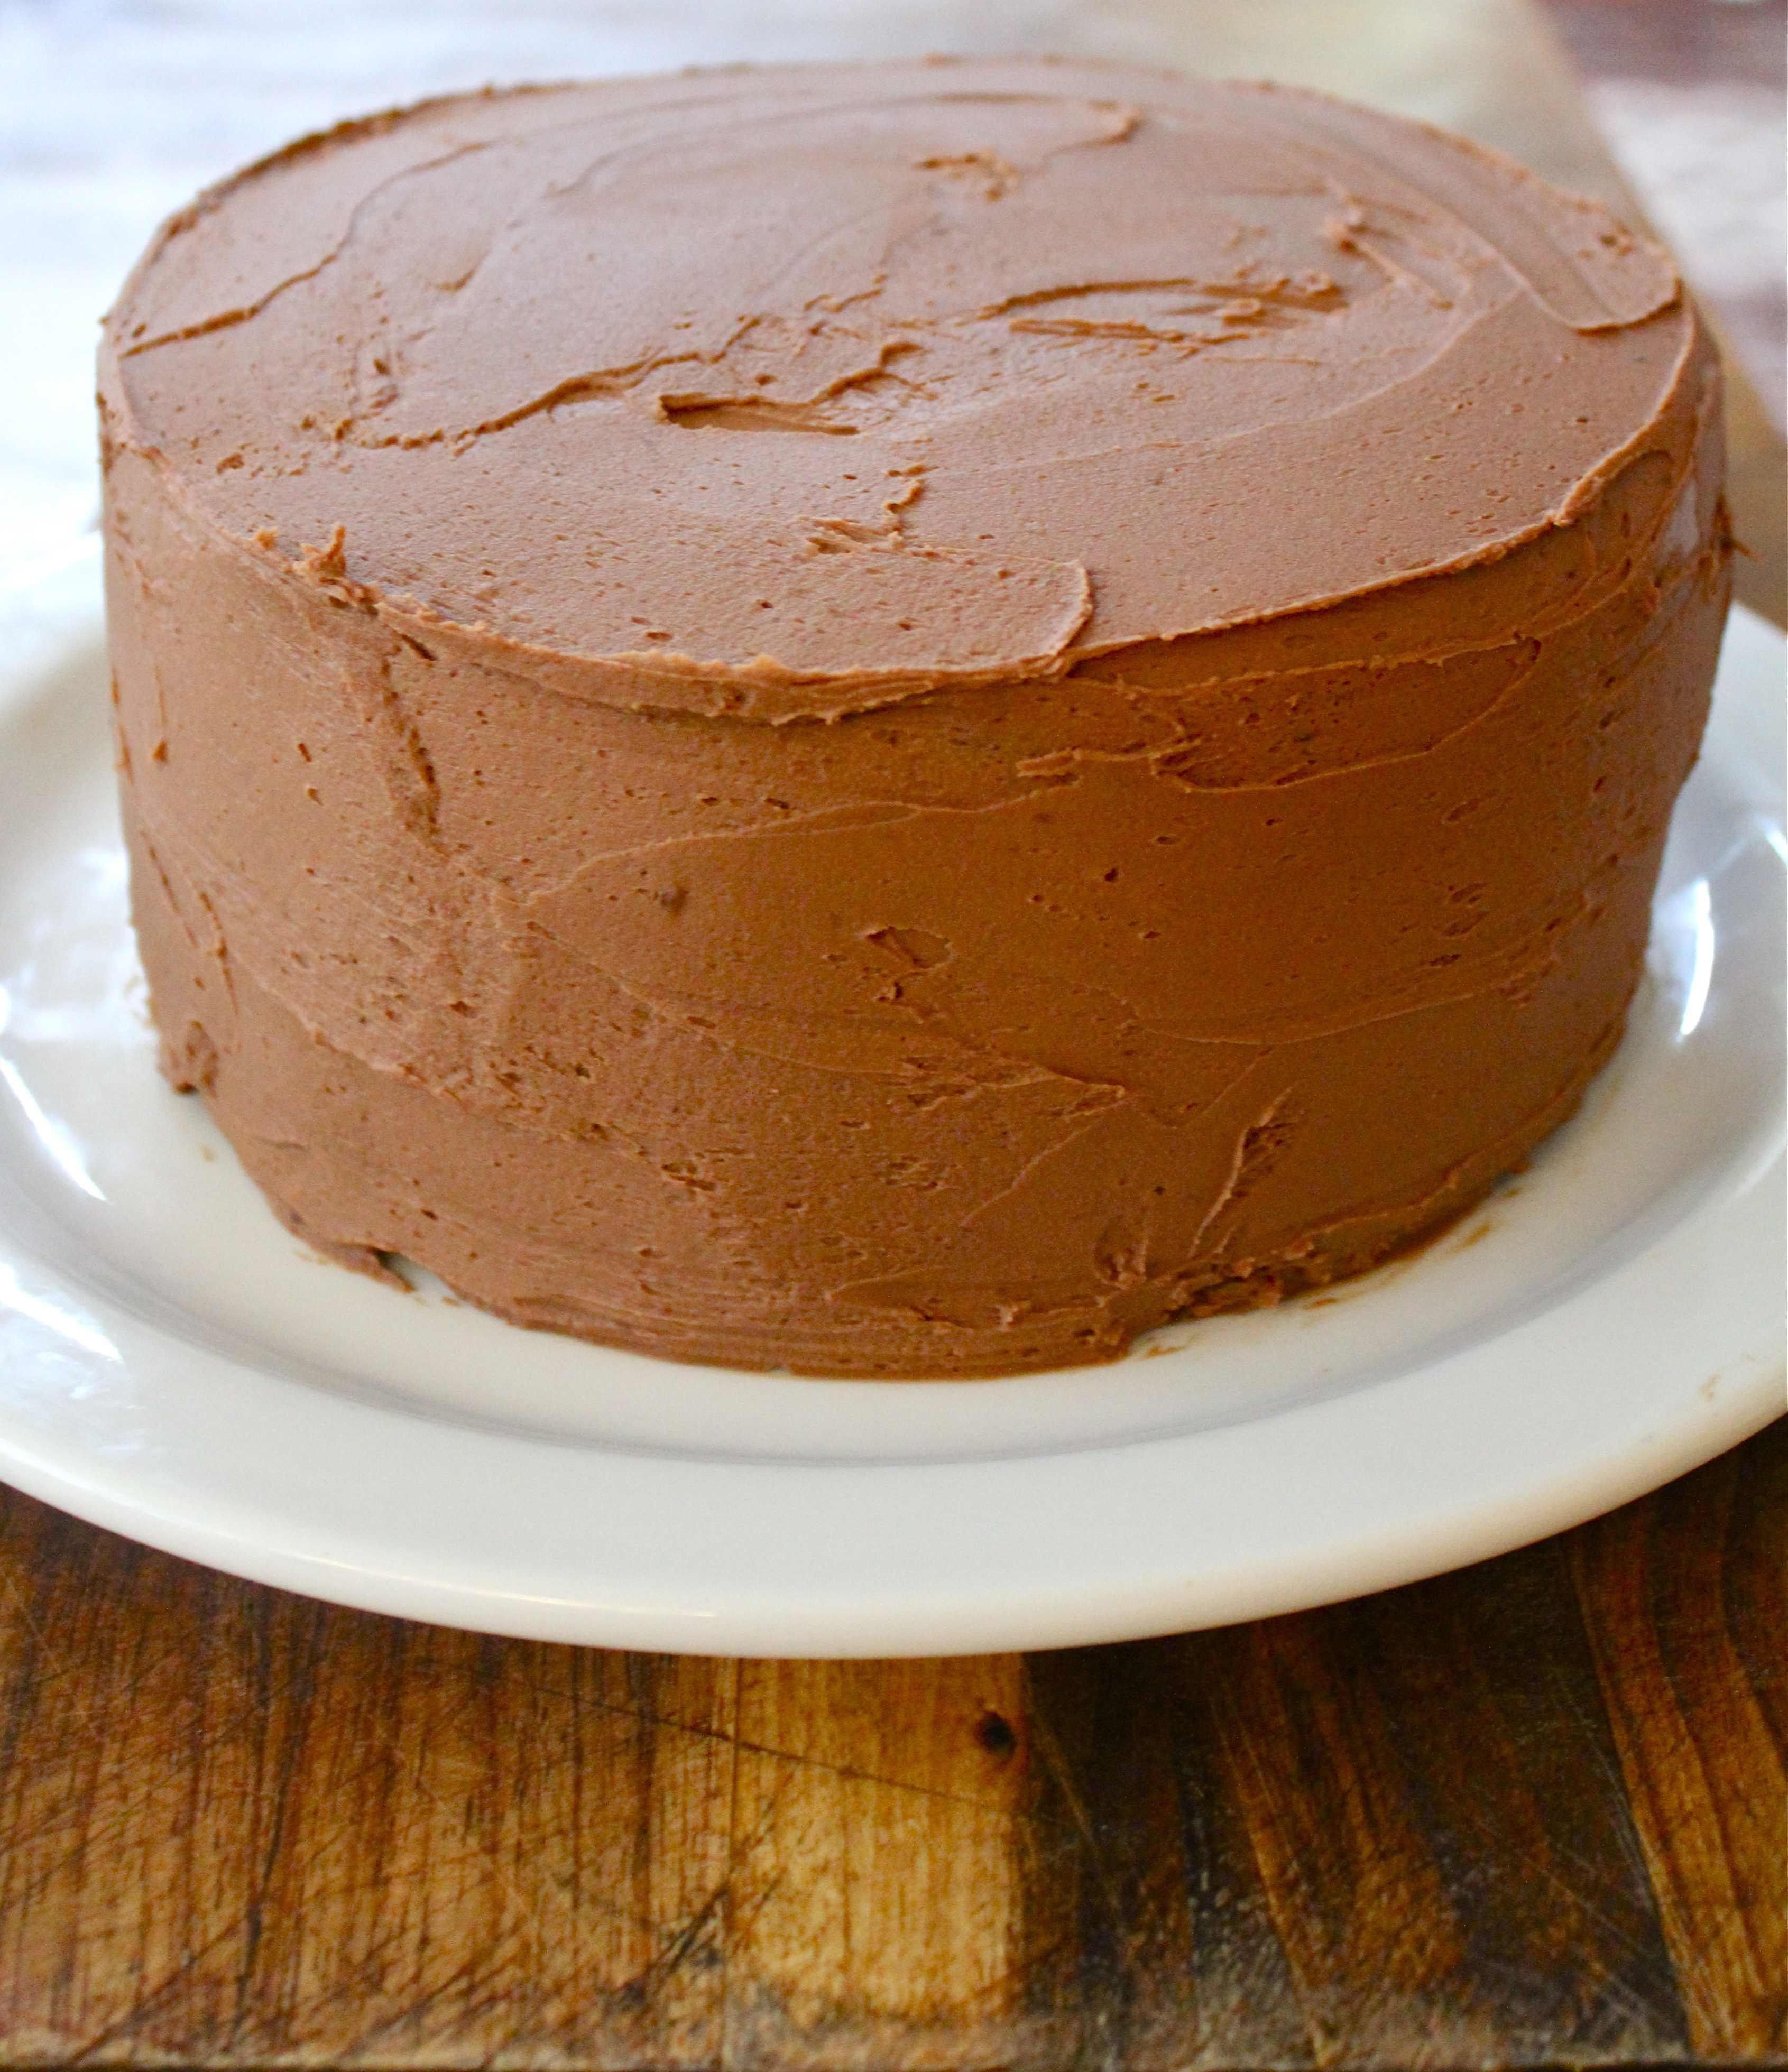 Caramelized Orange And Chocolate Layer Cake Recipes — Dishmaps